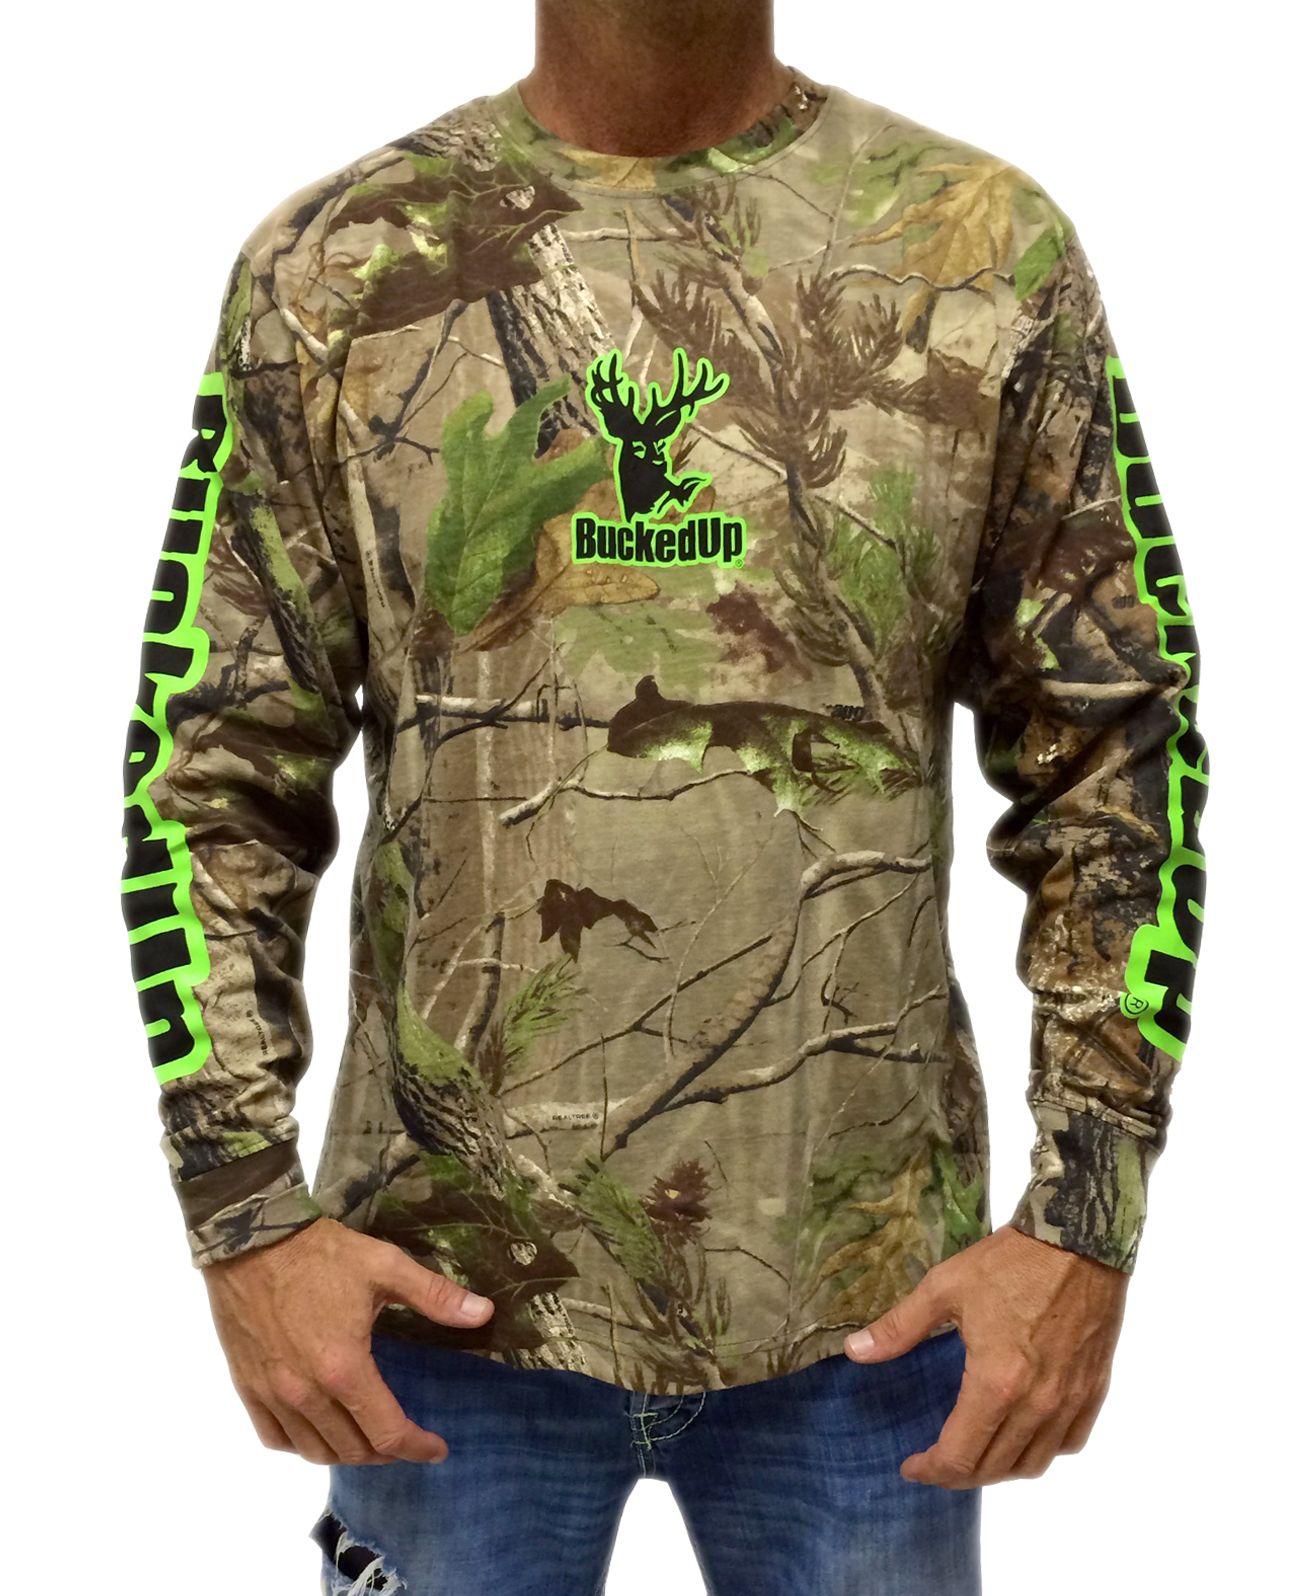 long sleeve realtree apg camo with classic buckedup logo green